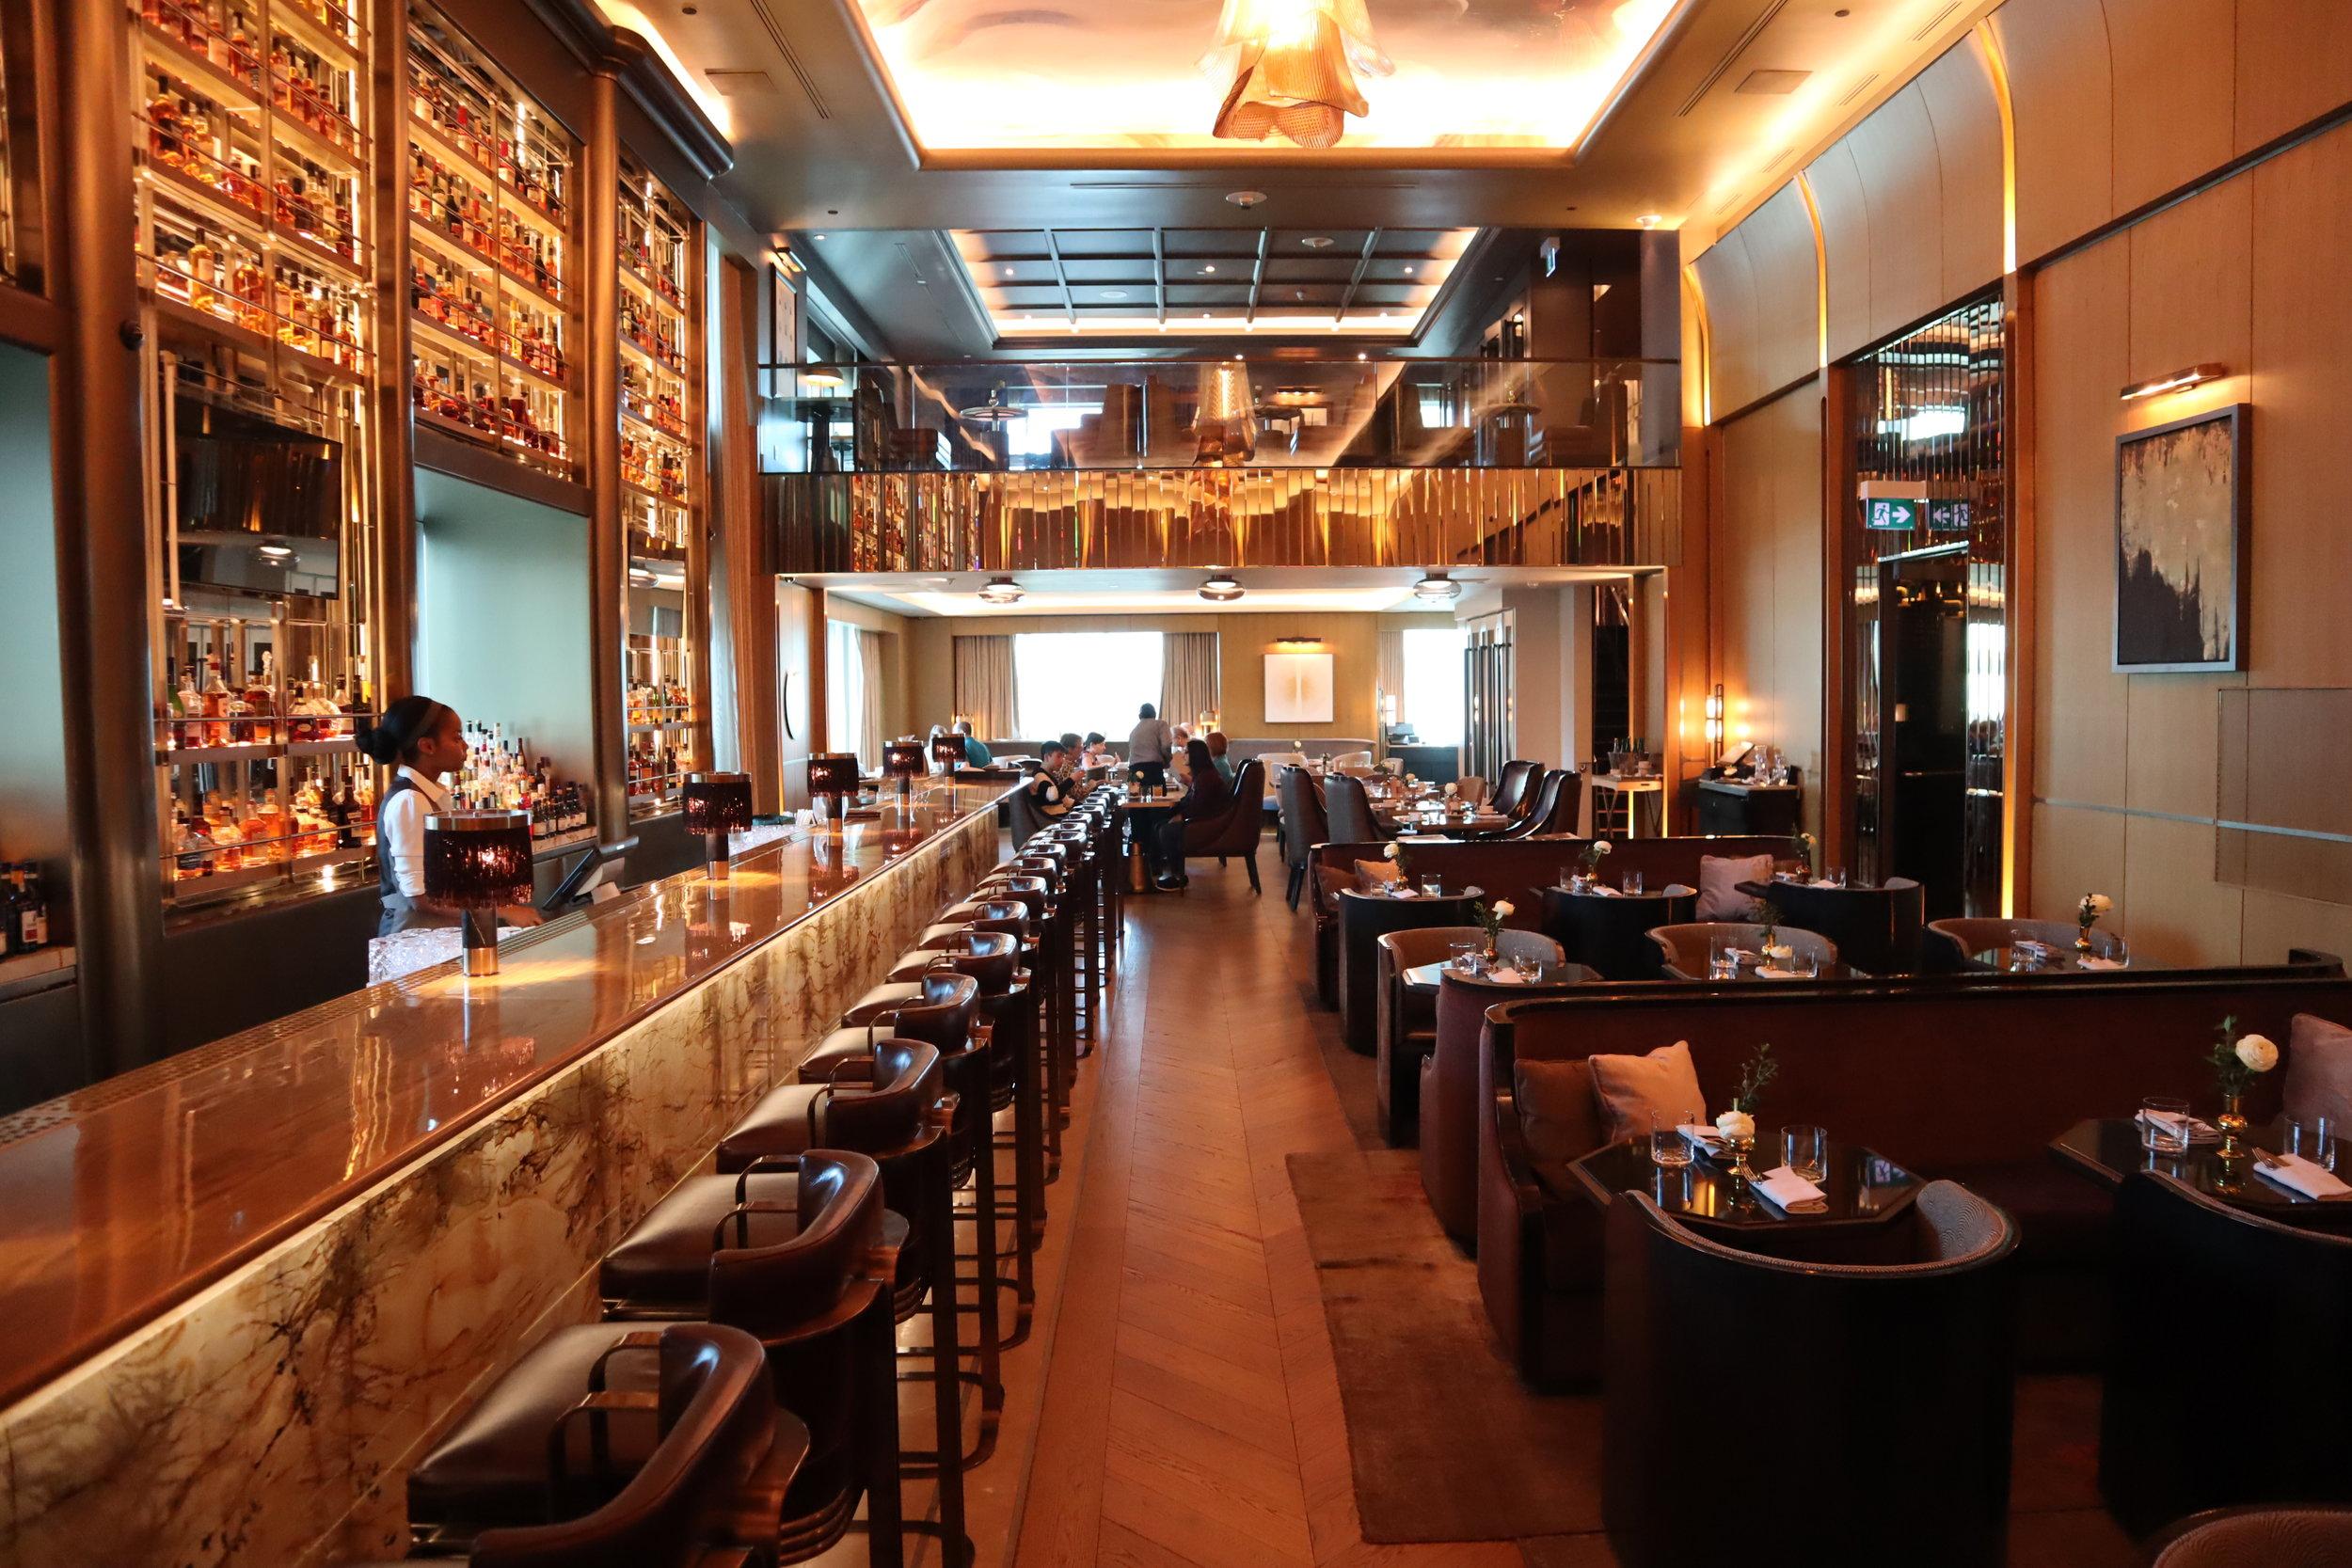 St. Regis Toronto – Louix Louis restaurant